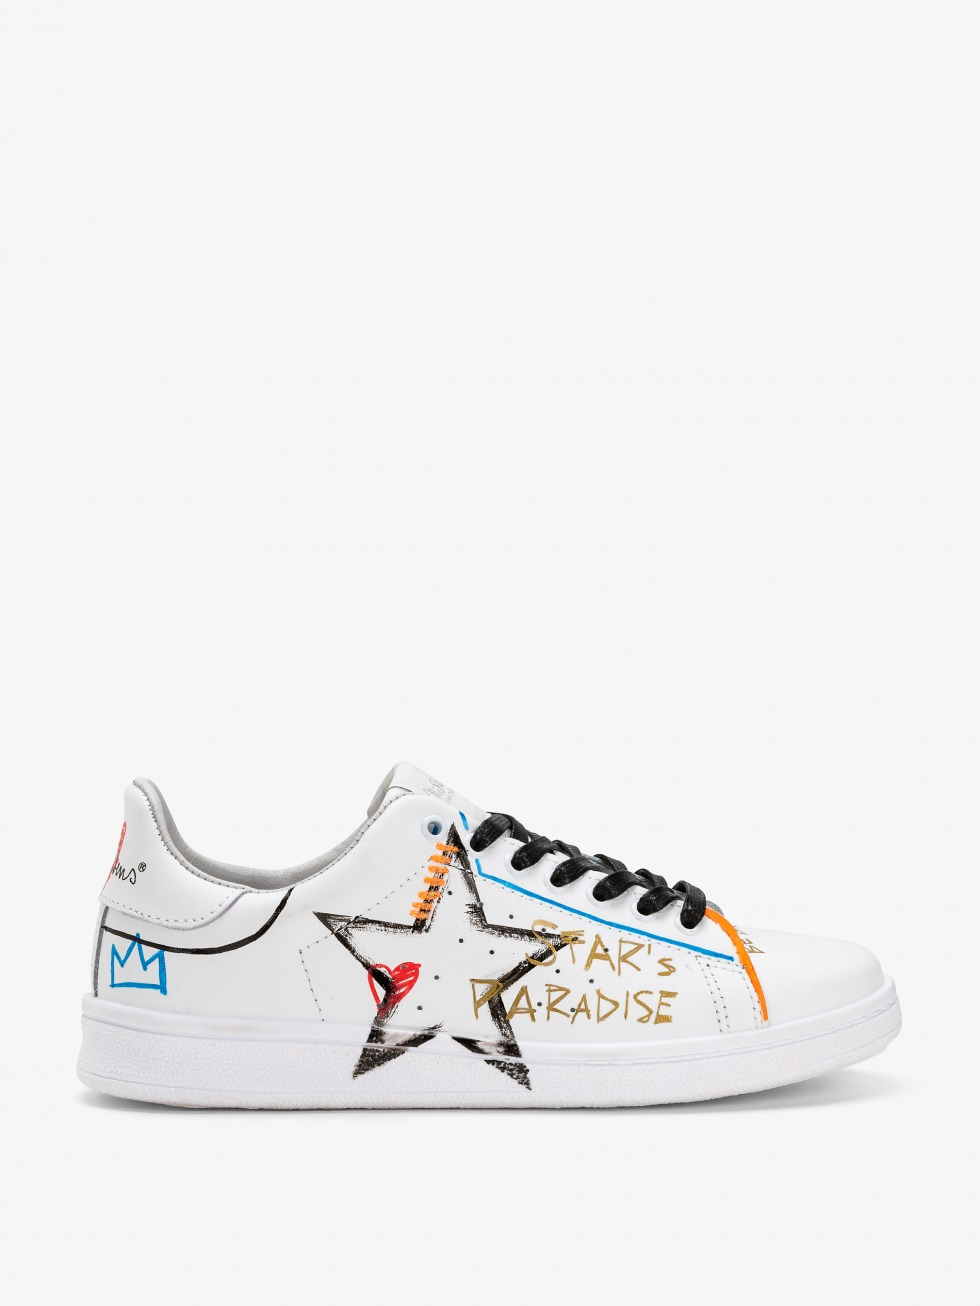 Daiquiri Sneakers - Heart's Rainbow